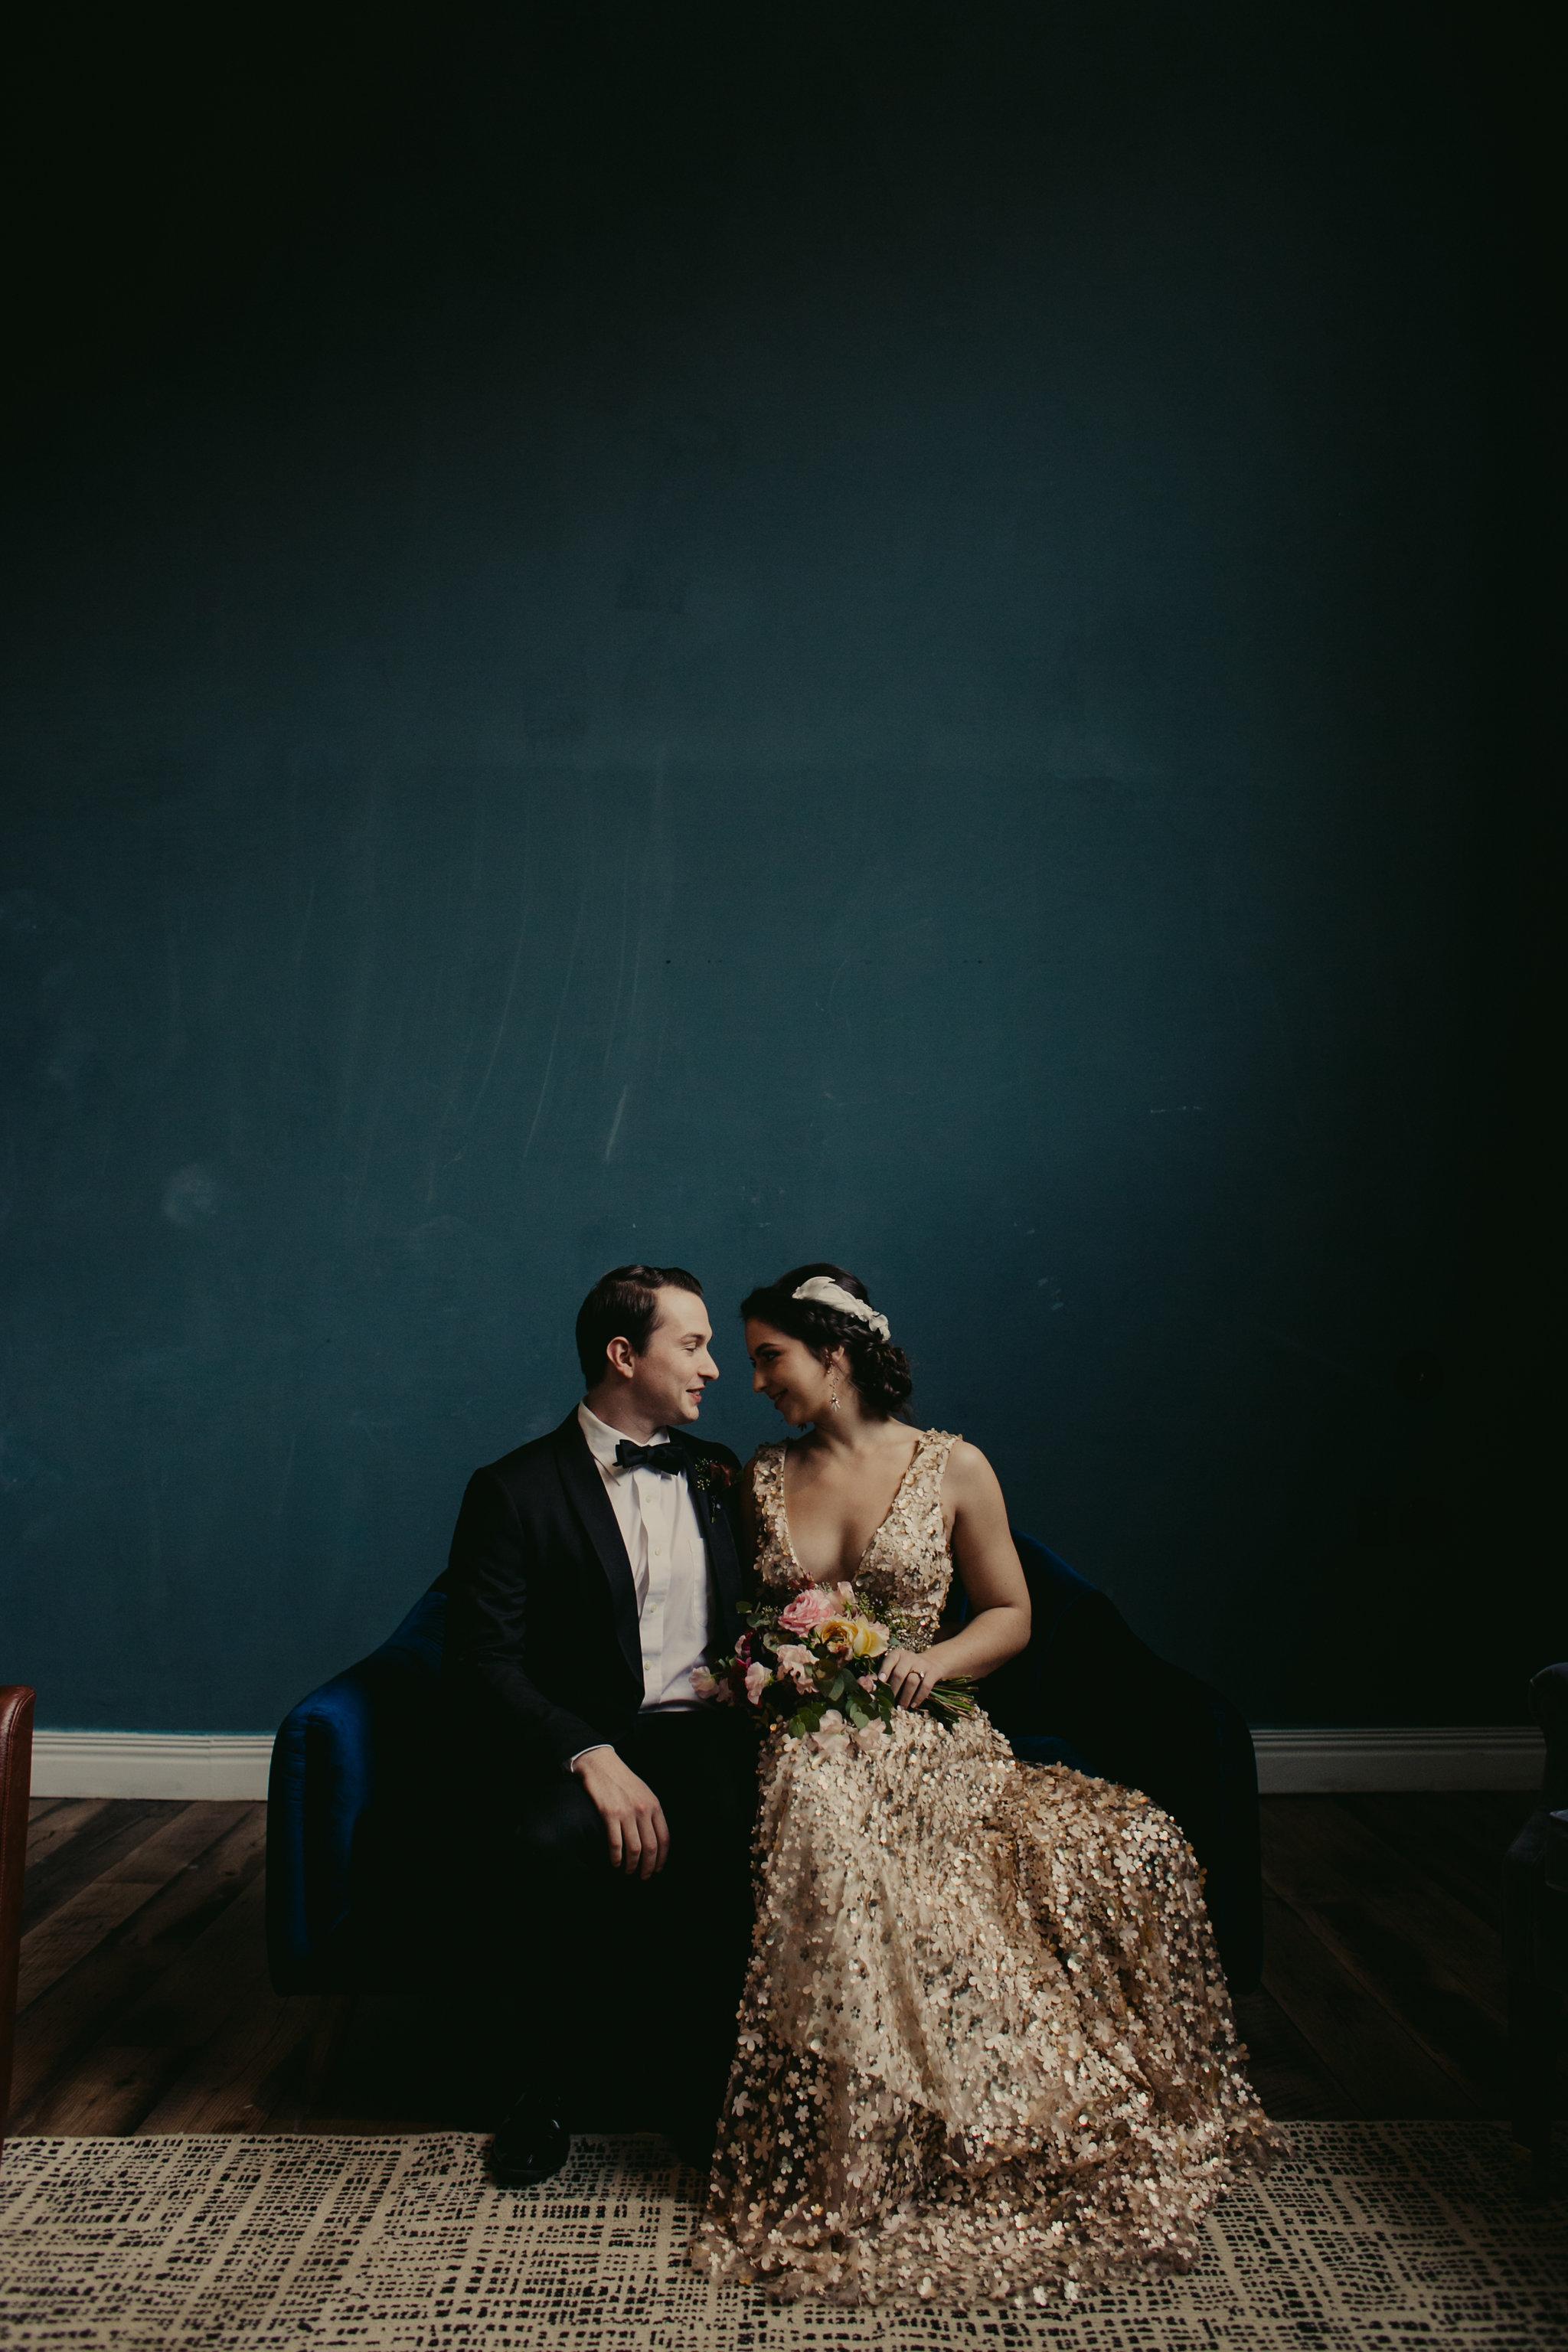 Williamsburg_Hotel_Wedding_Photographer_Chellise_Michael_Photography-153.jpg